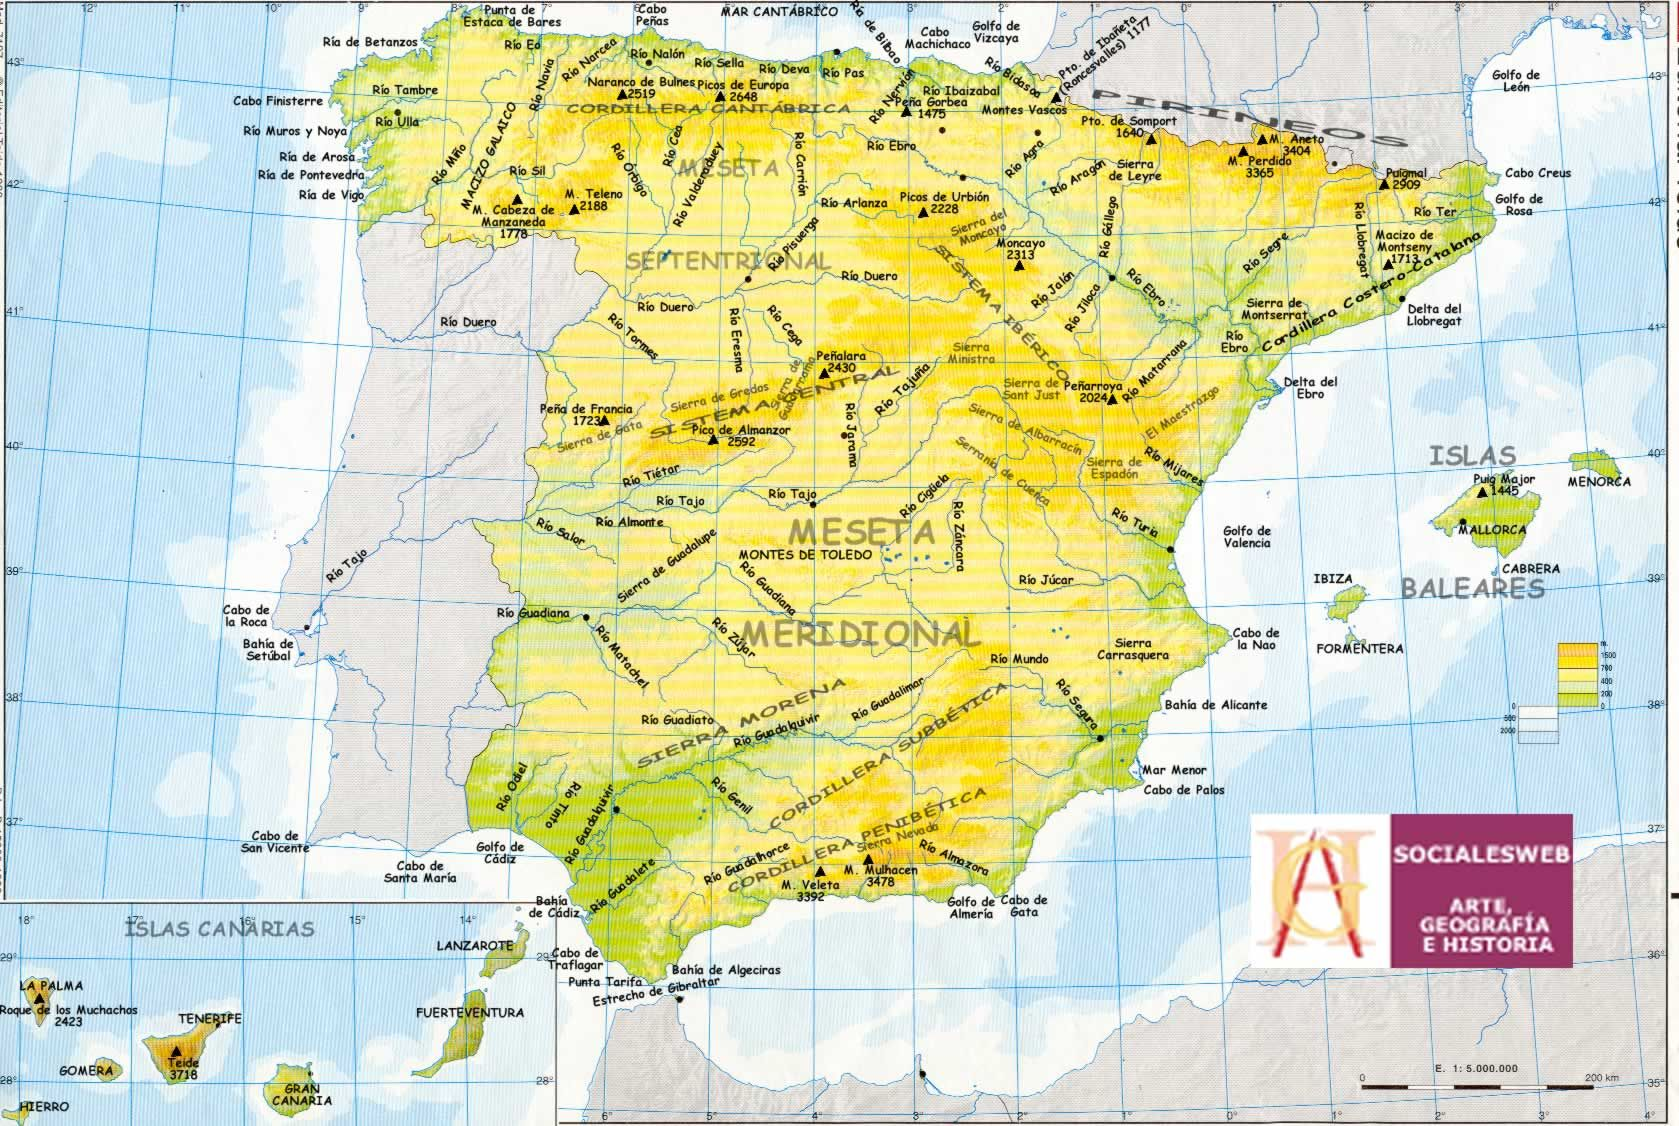 Mapa Fisico Peninsula Iberica Rios.Cabos Golfos Rios De Espana Rios De Espana Mapa De